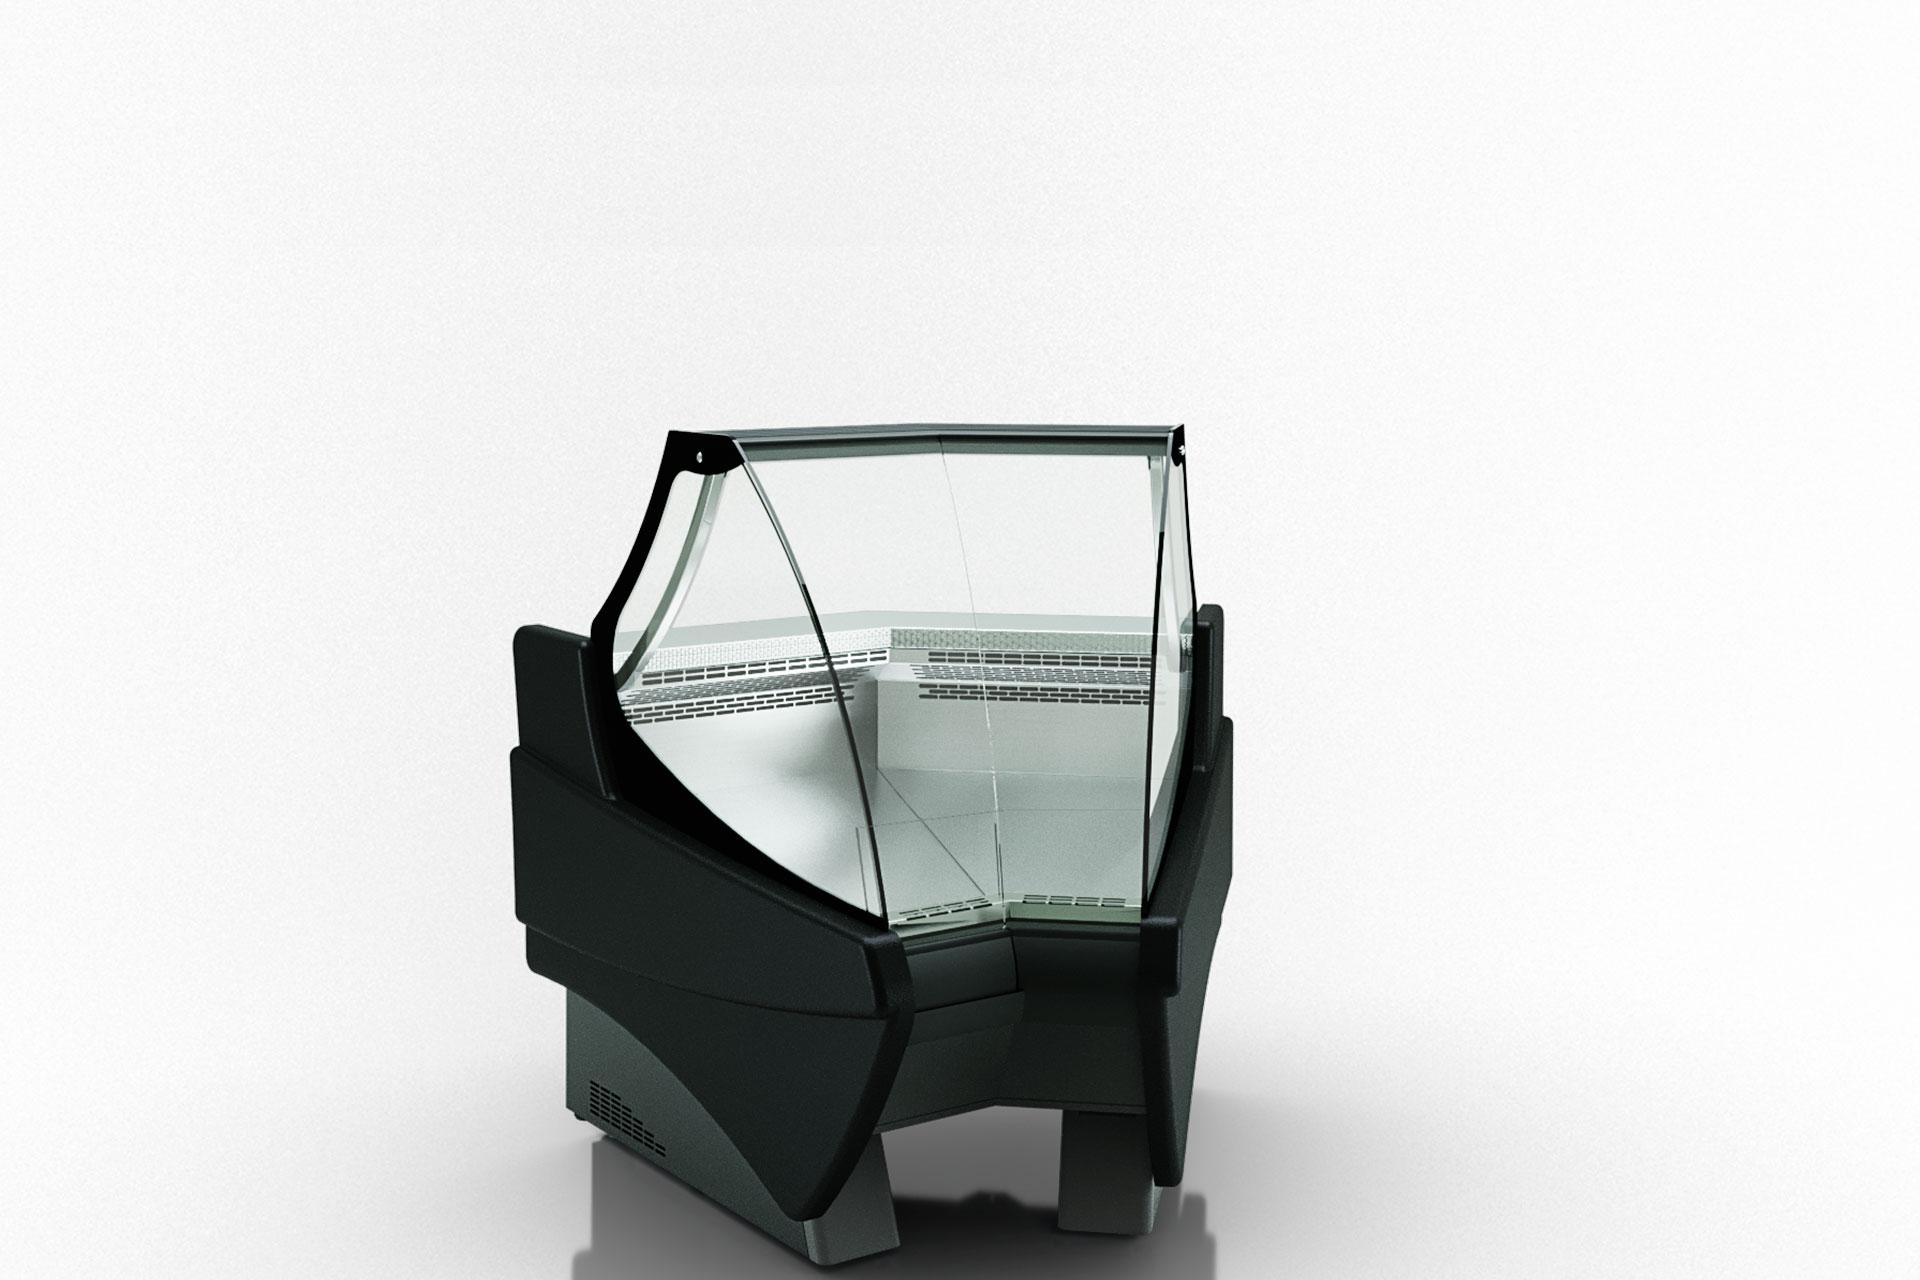 Вітрина Symphony luxe MG 120 deli PS 125-DLM-IS45